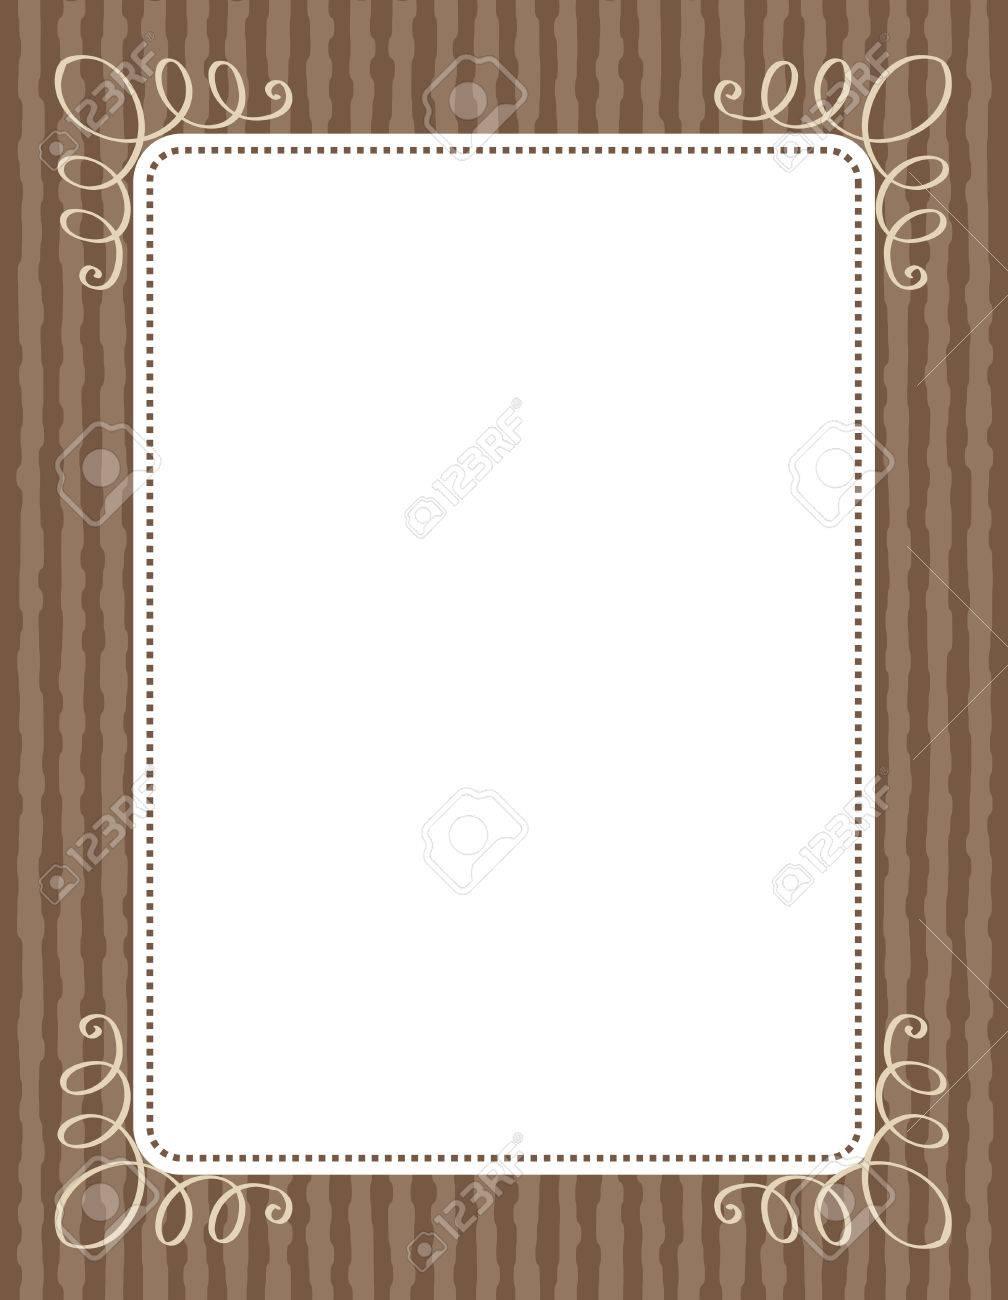 Retro Wooden Wedding Invitation/ Anniversary Background / Frame ...